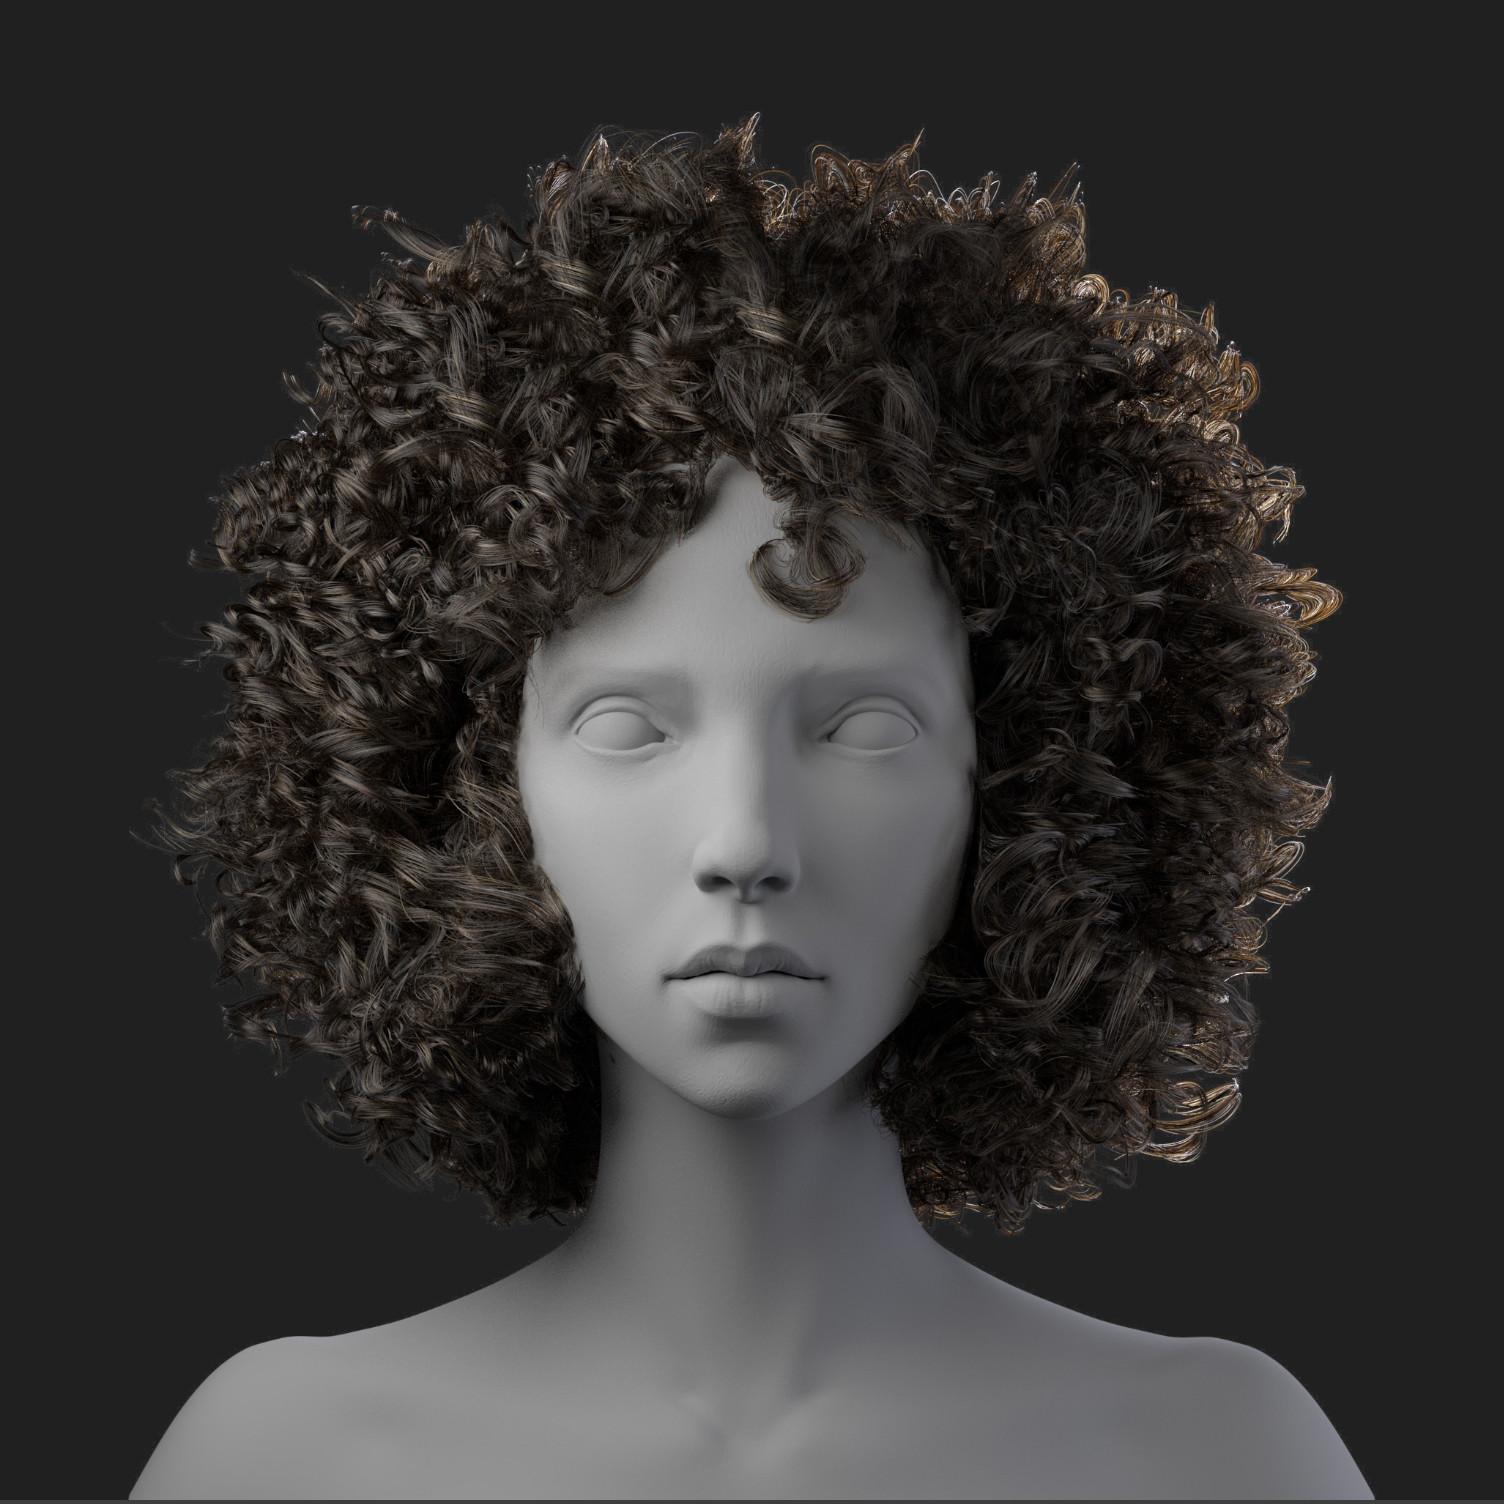 Maya Xgen Curly Hair - Short Curly Hair